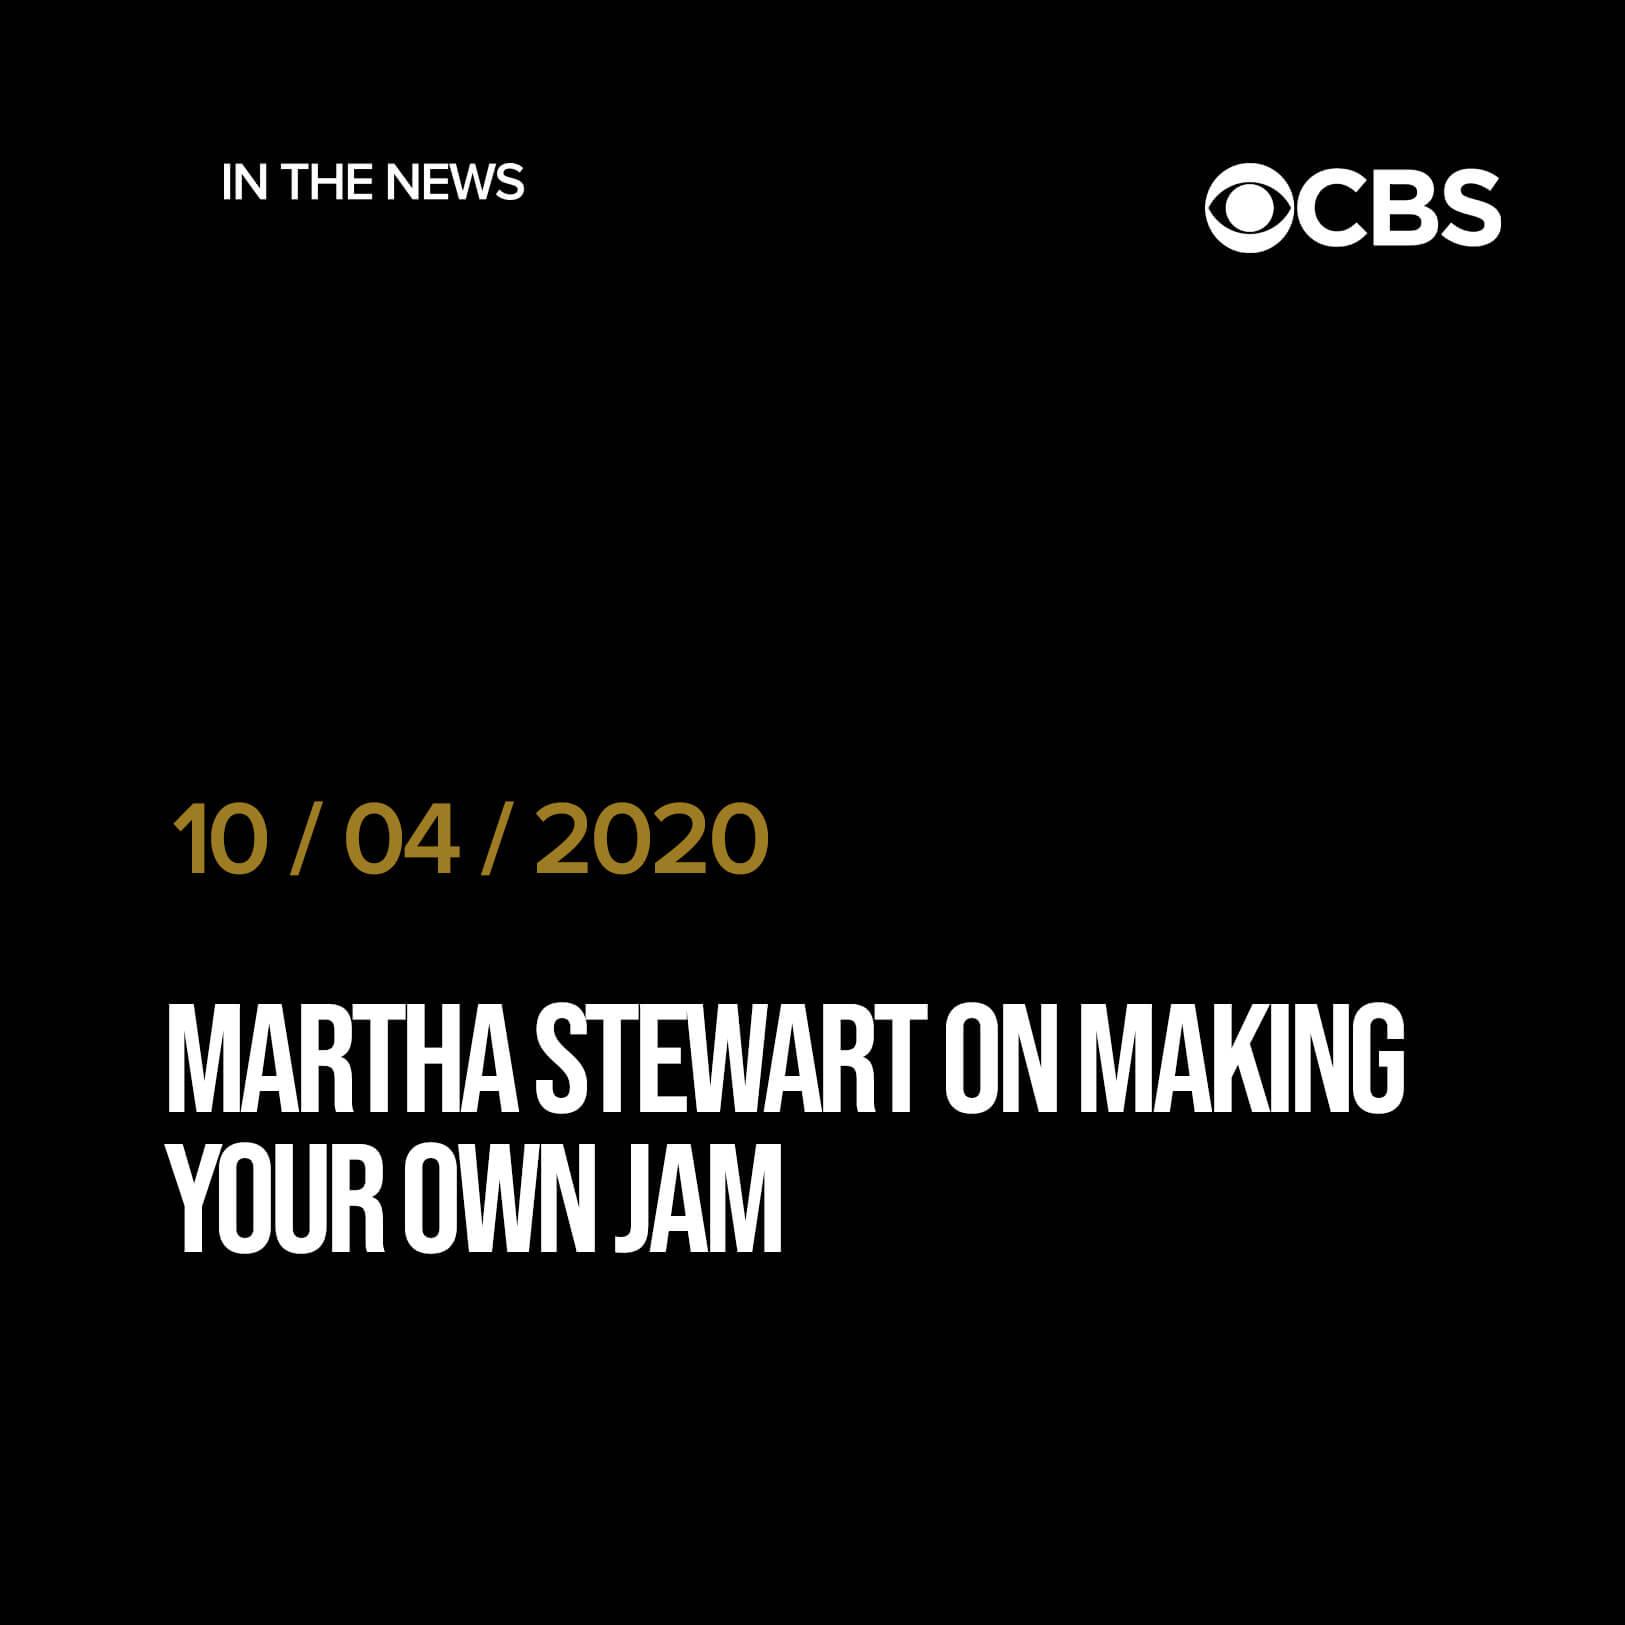 Martha Stewart on making your own jam